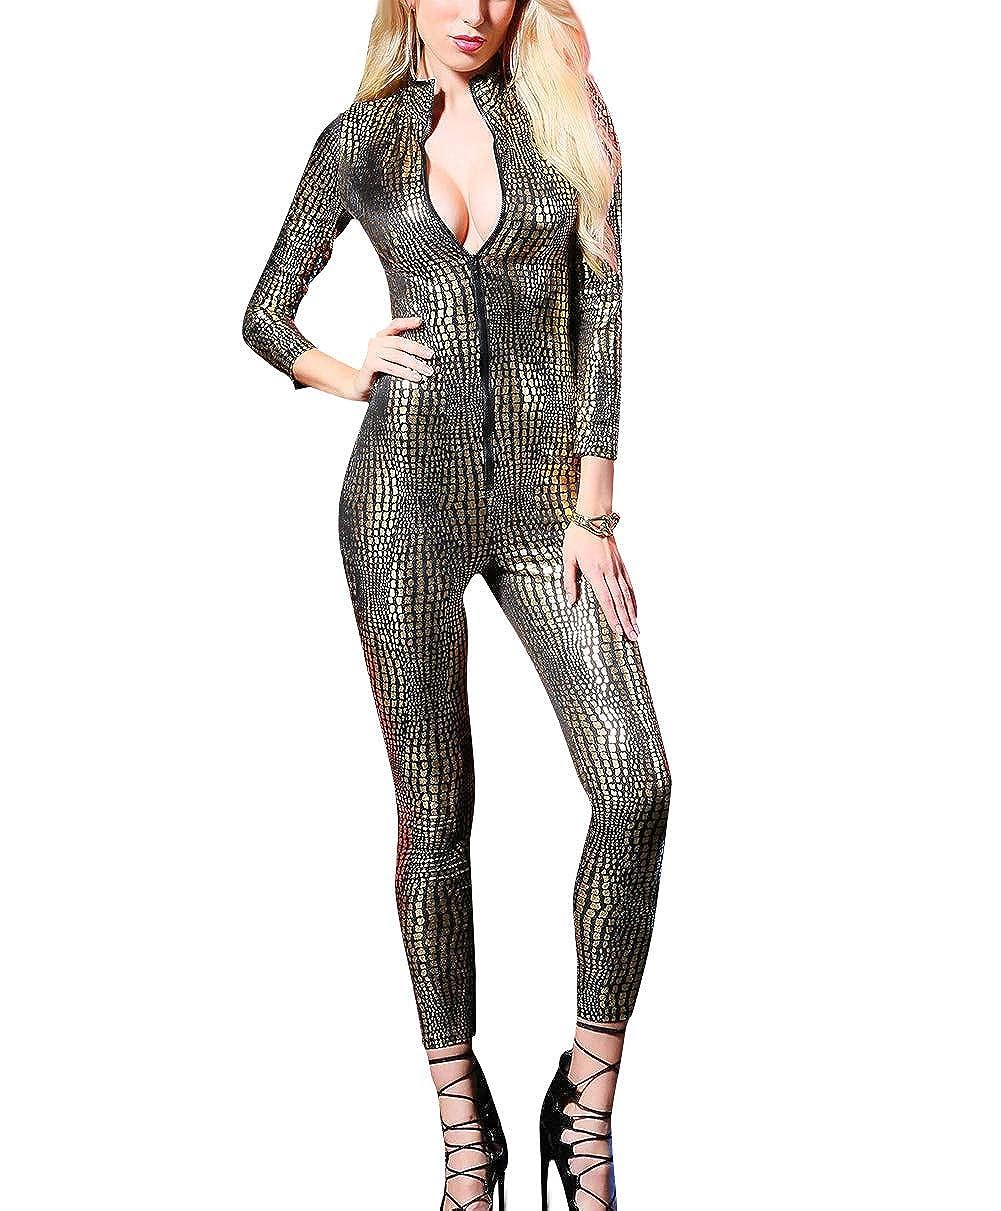 Women's Snakeskin One Piece Catsuit Skinny Bodysuit Sequin Costume Clubwear Panegy